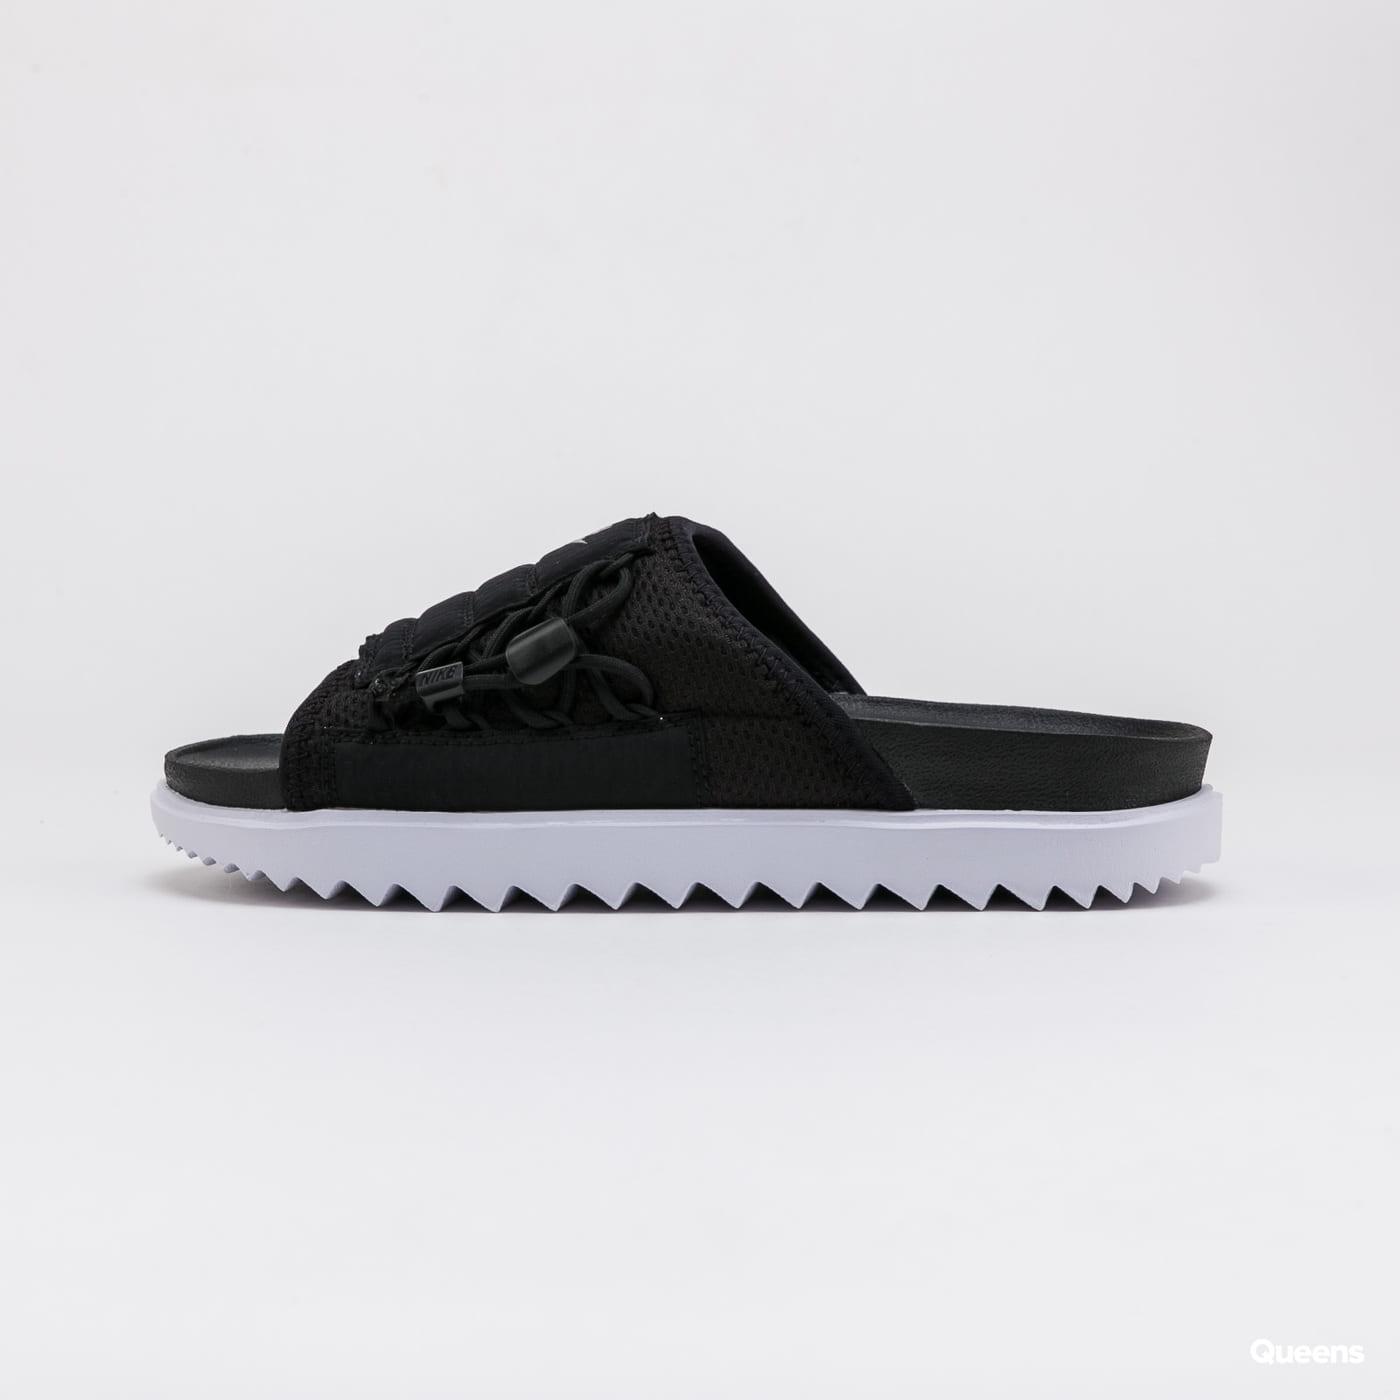 Nike WMNS Asuna Slide black / anthracite - white